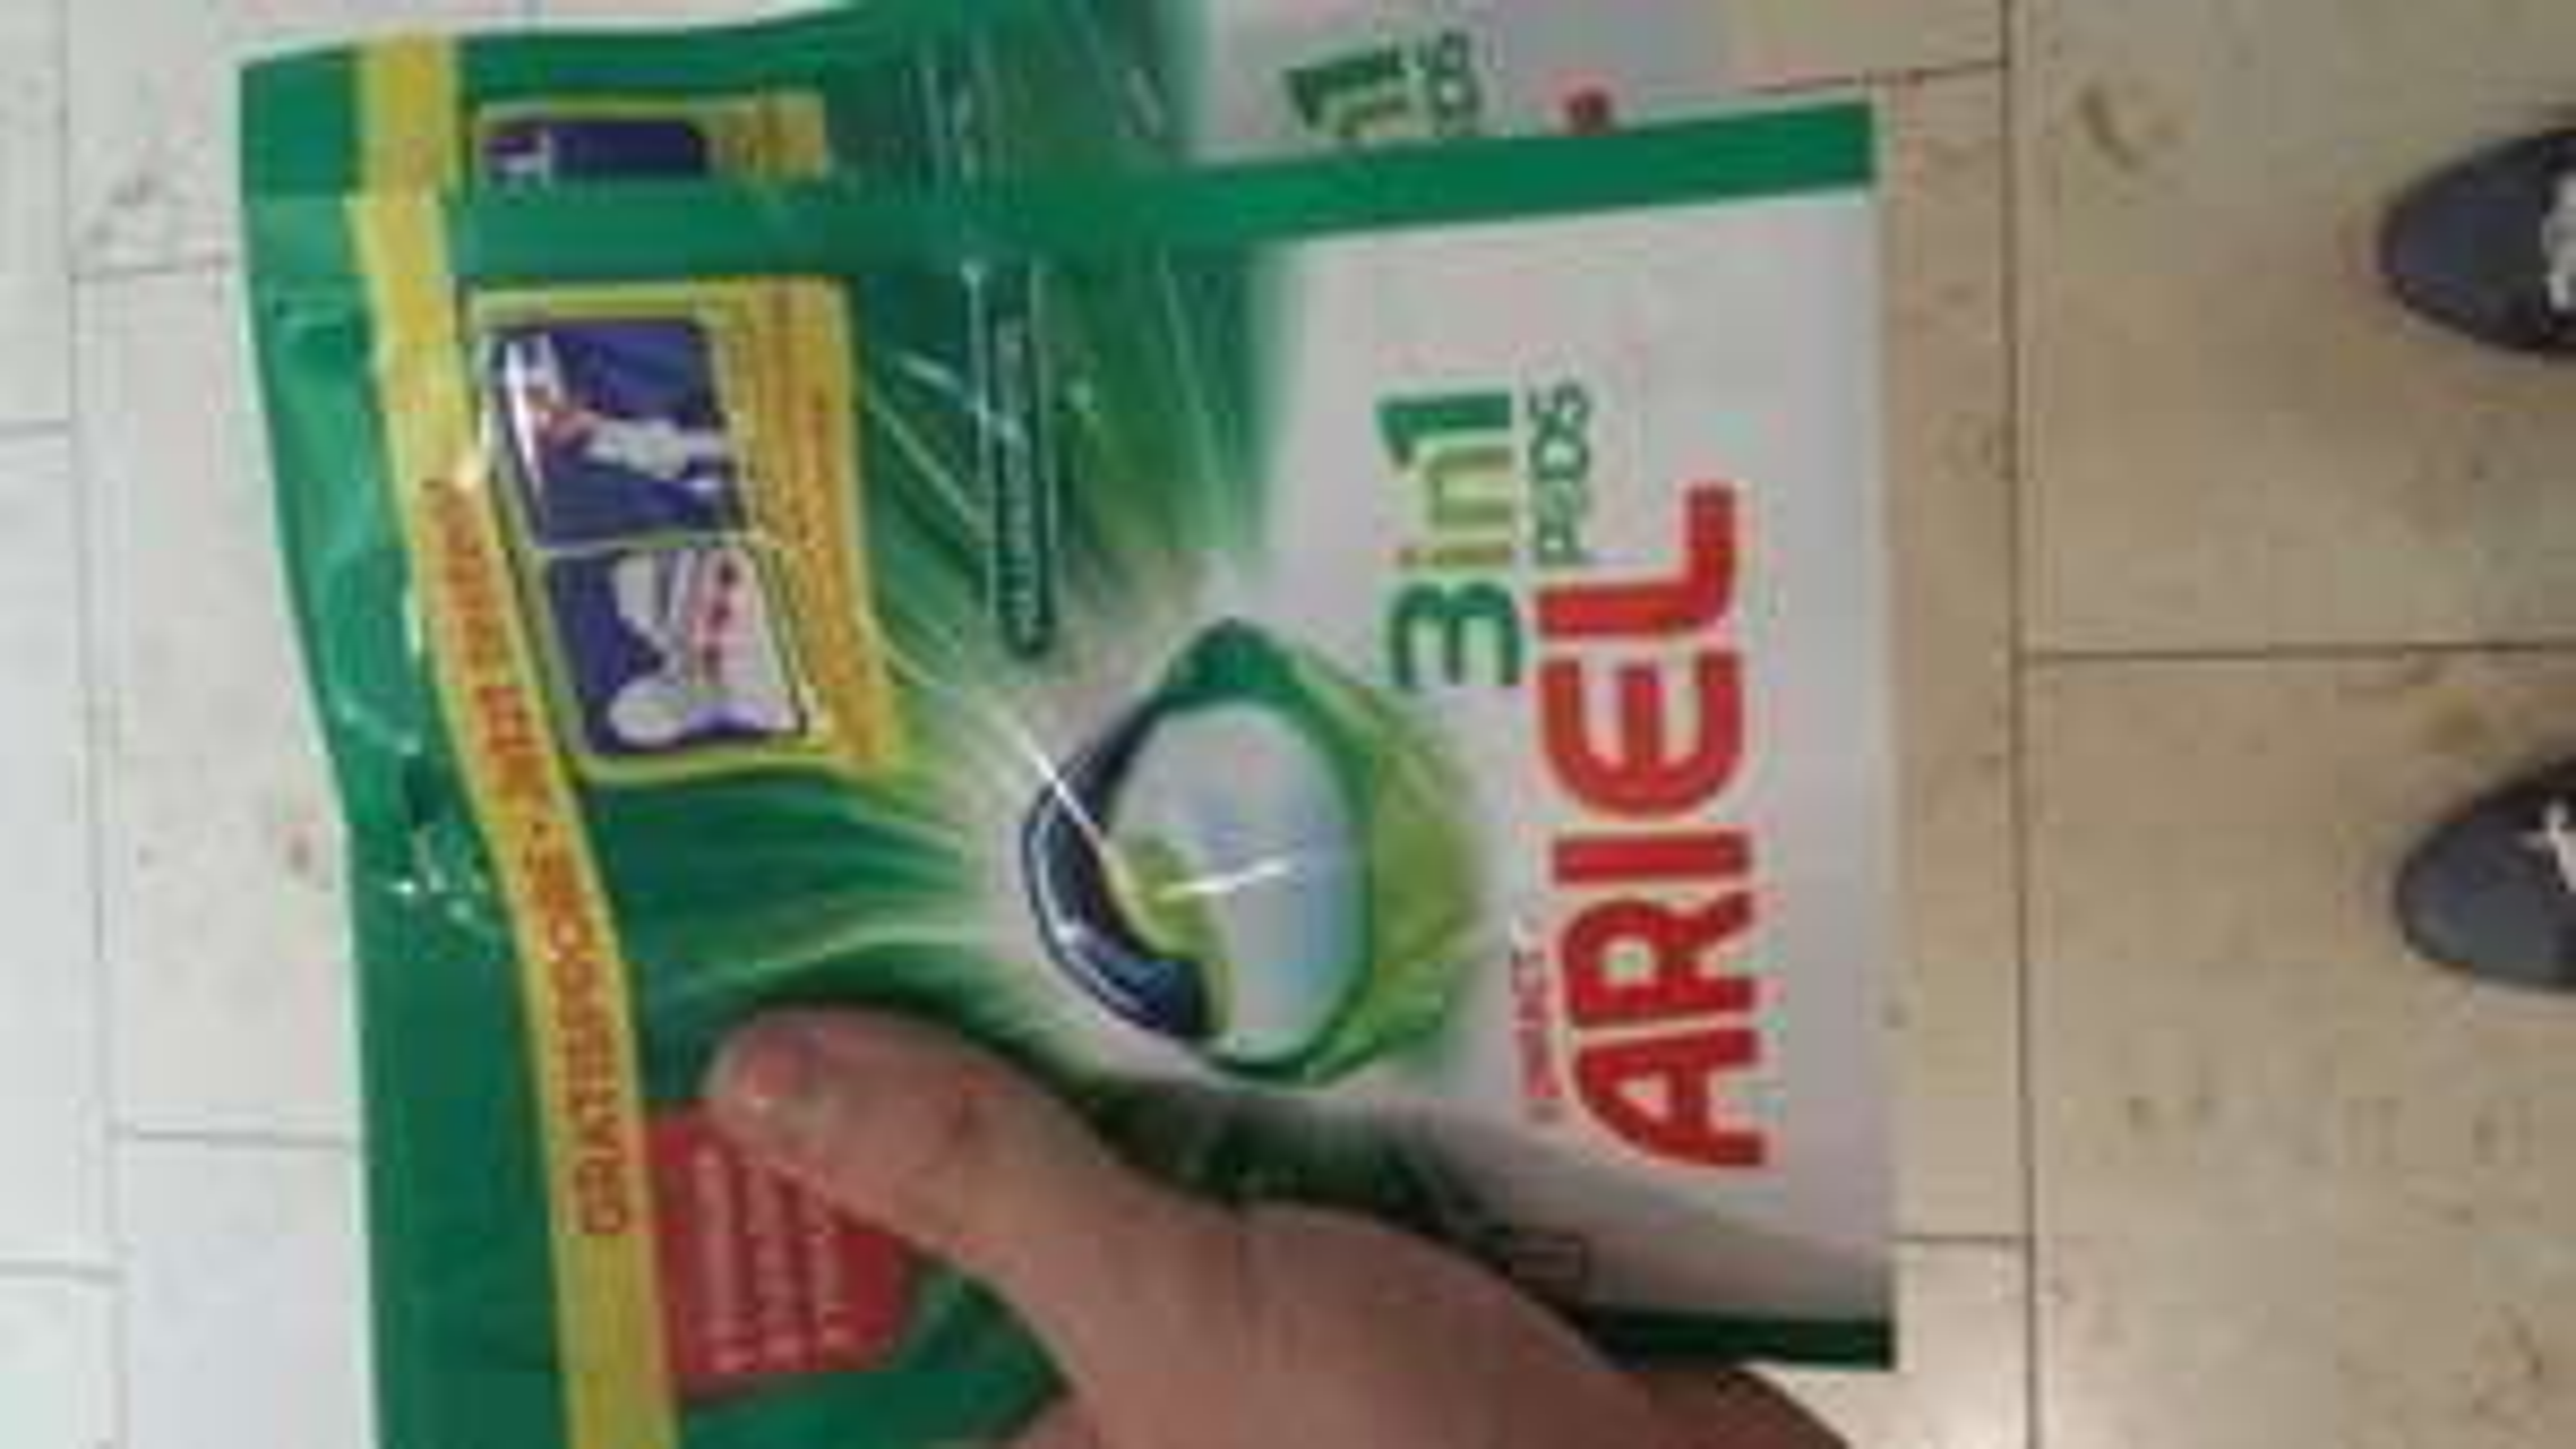 Gratis Ariel compact pods im dm